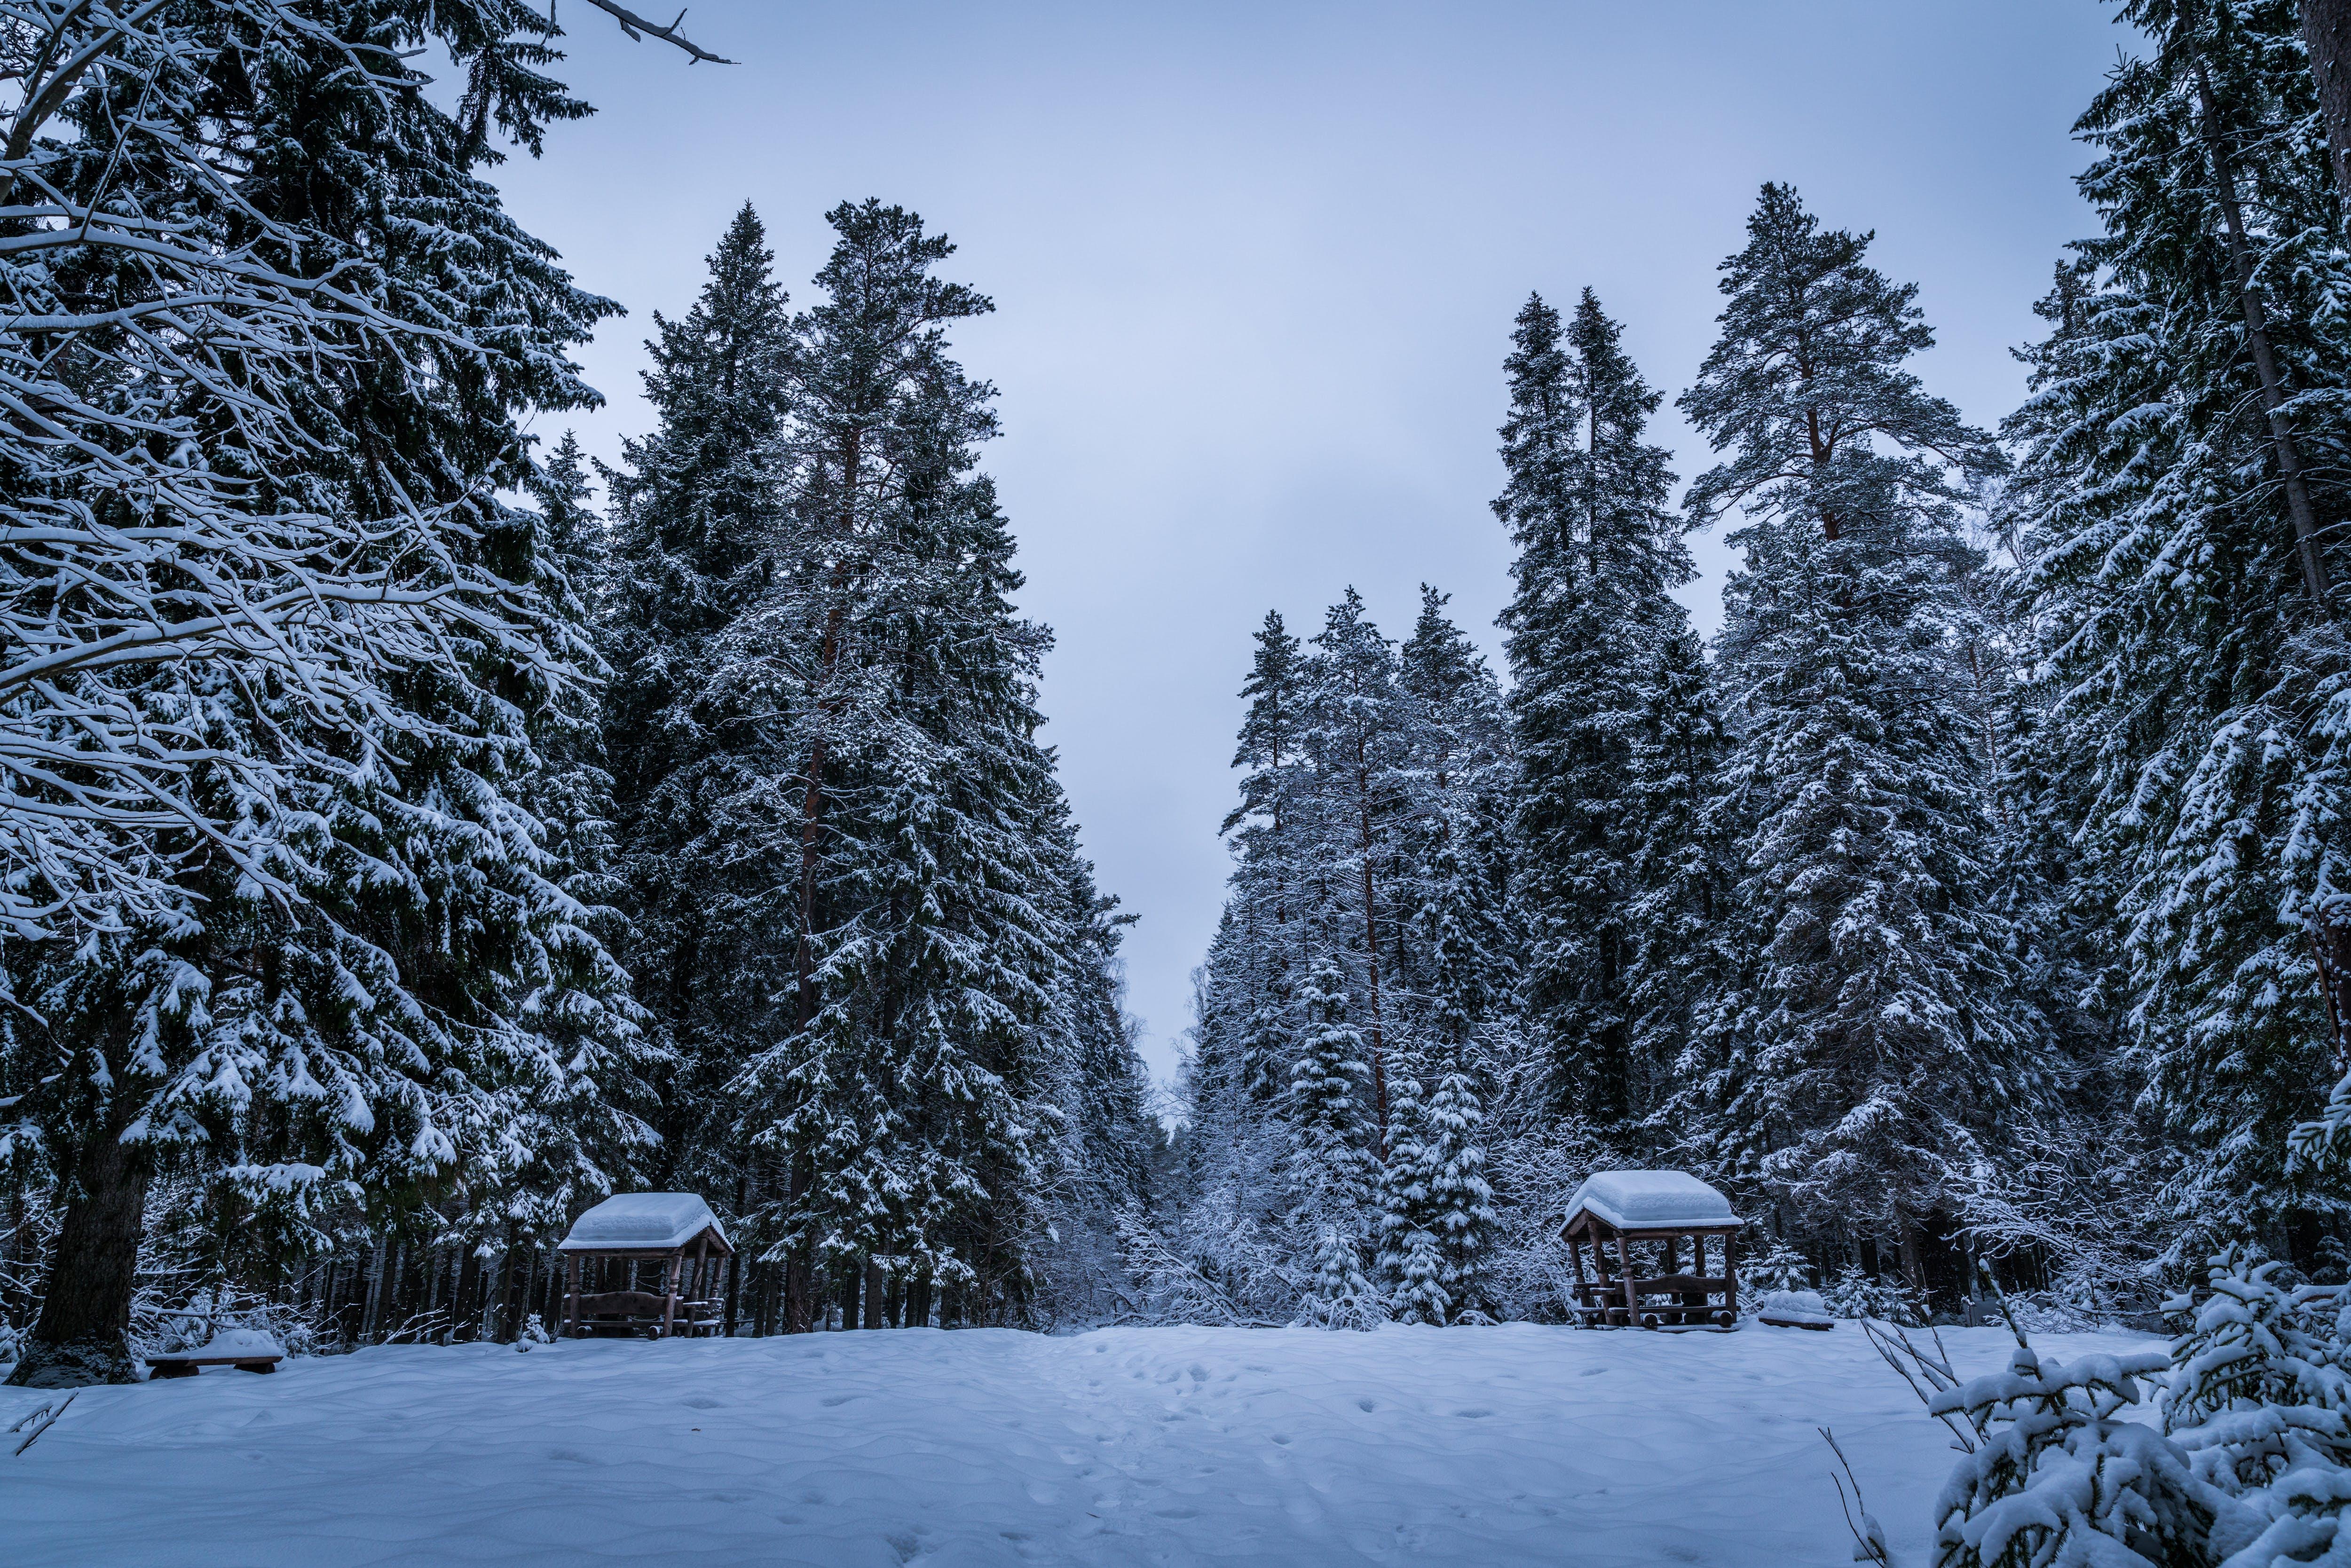 Foto stok gratis beku, cuaca, dingin, embun beku